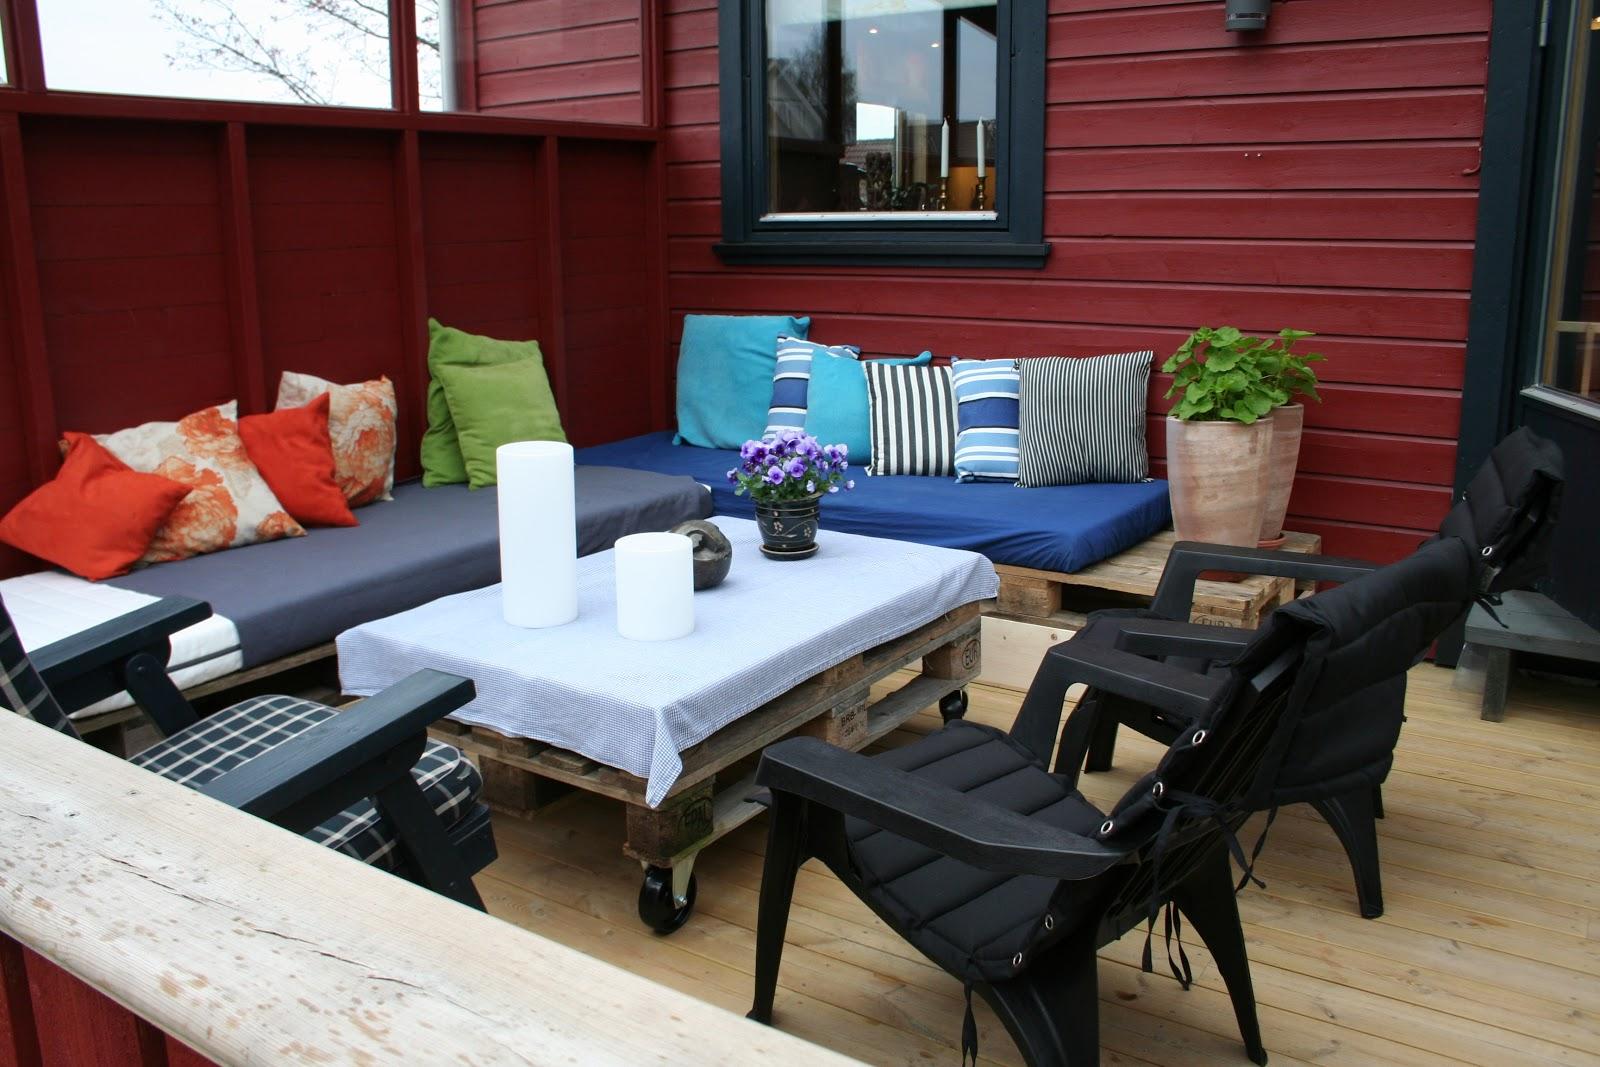 101 ideas de decoracion con palets hoy lowcost - Palets decoracion jardin ...